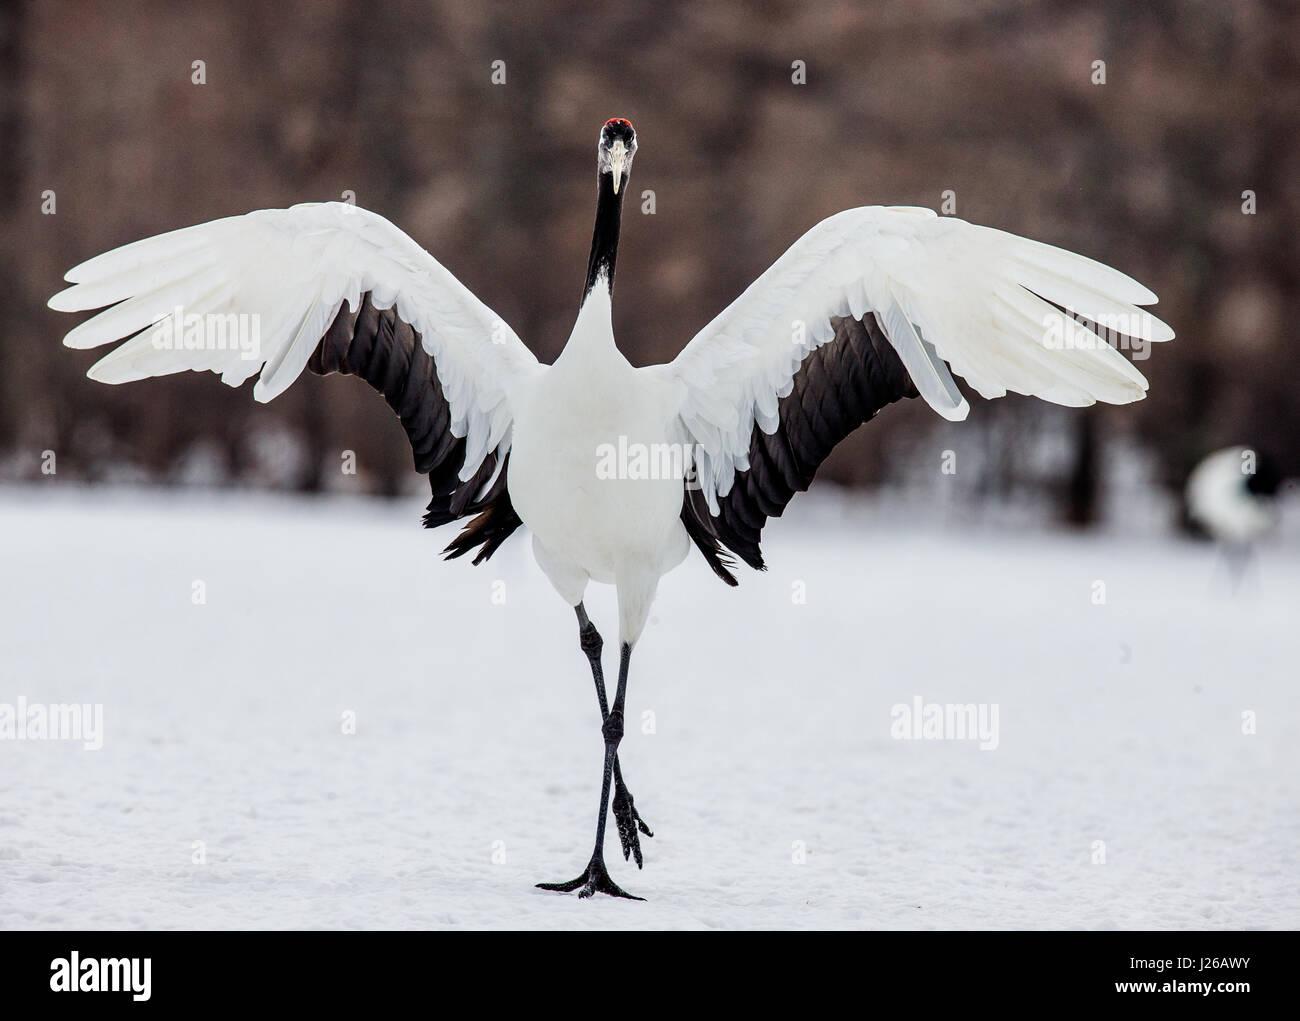 The Japanese crane spread its wings. Japan. Hokkaido. Tsurui. Great illustration. - Stock Image